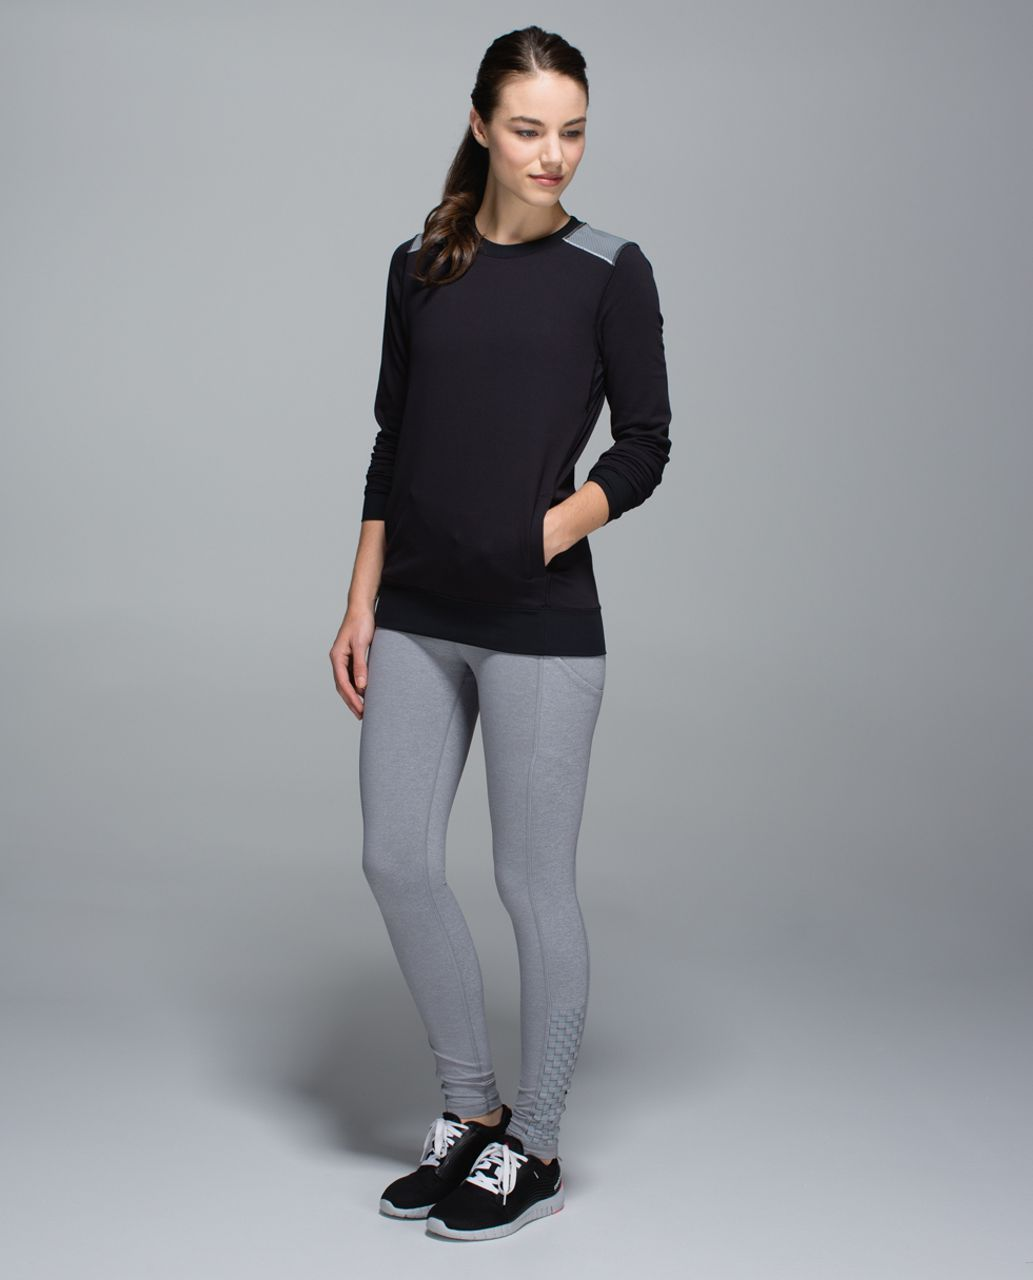 Lululemon In A Flash Long Sleeve - Hyper Stripe Black Soot / Black / Silver